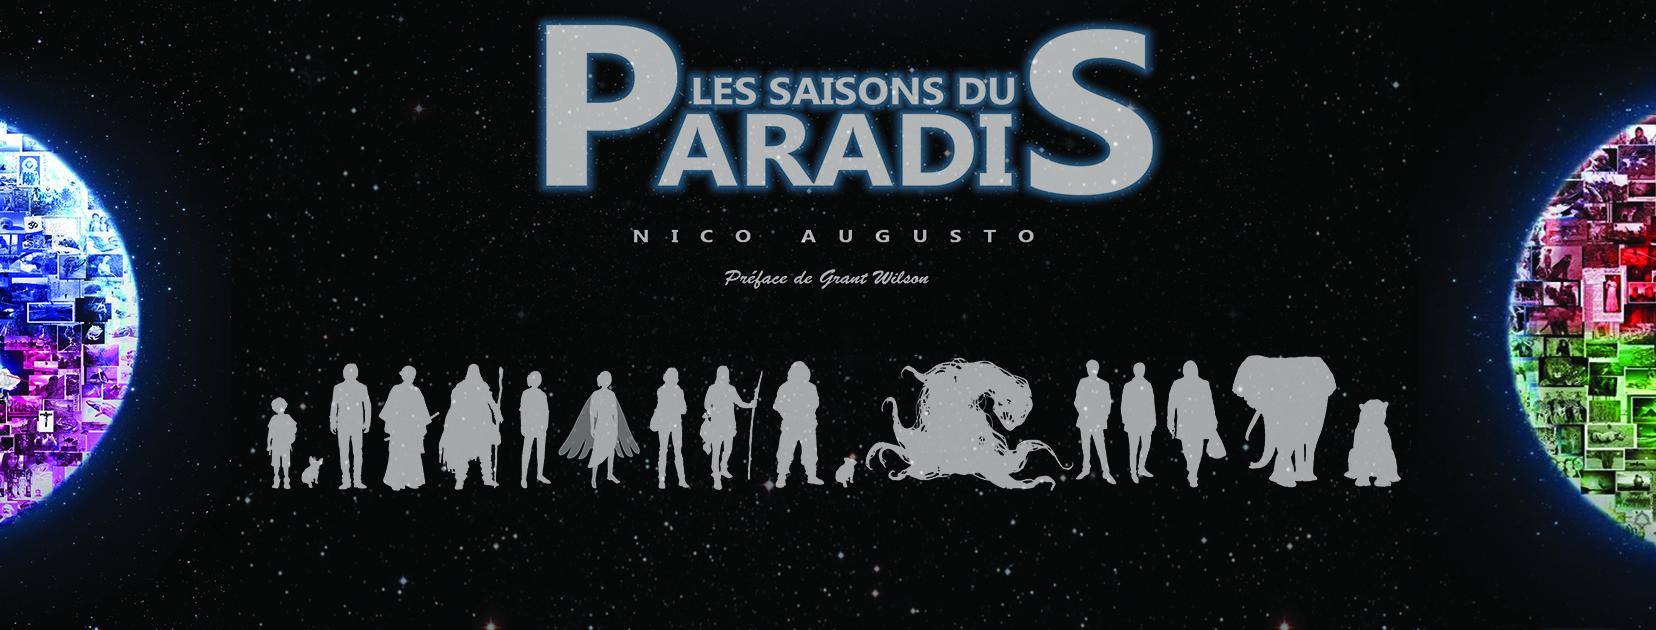 Les Saisons du Paradis - Nico Augusto (2)